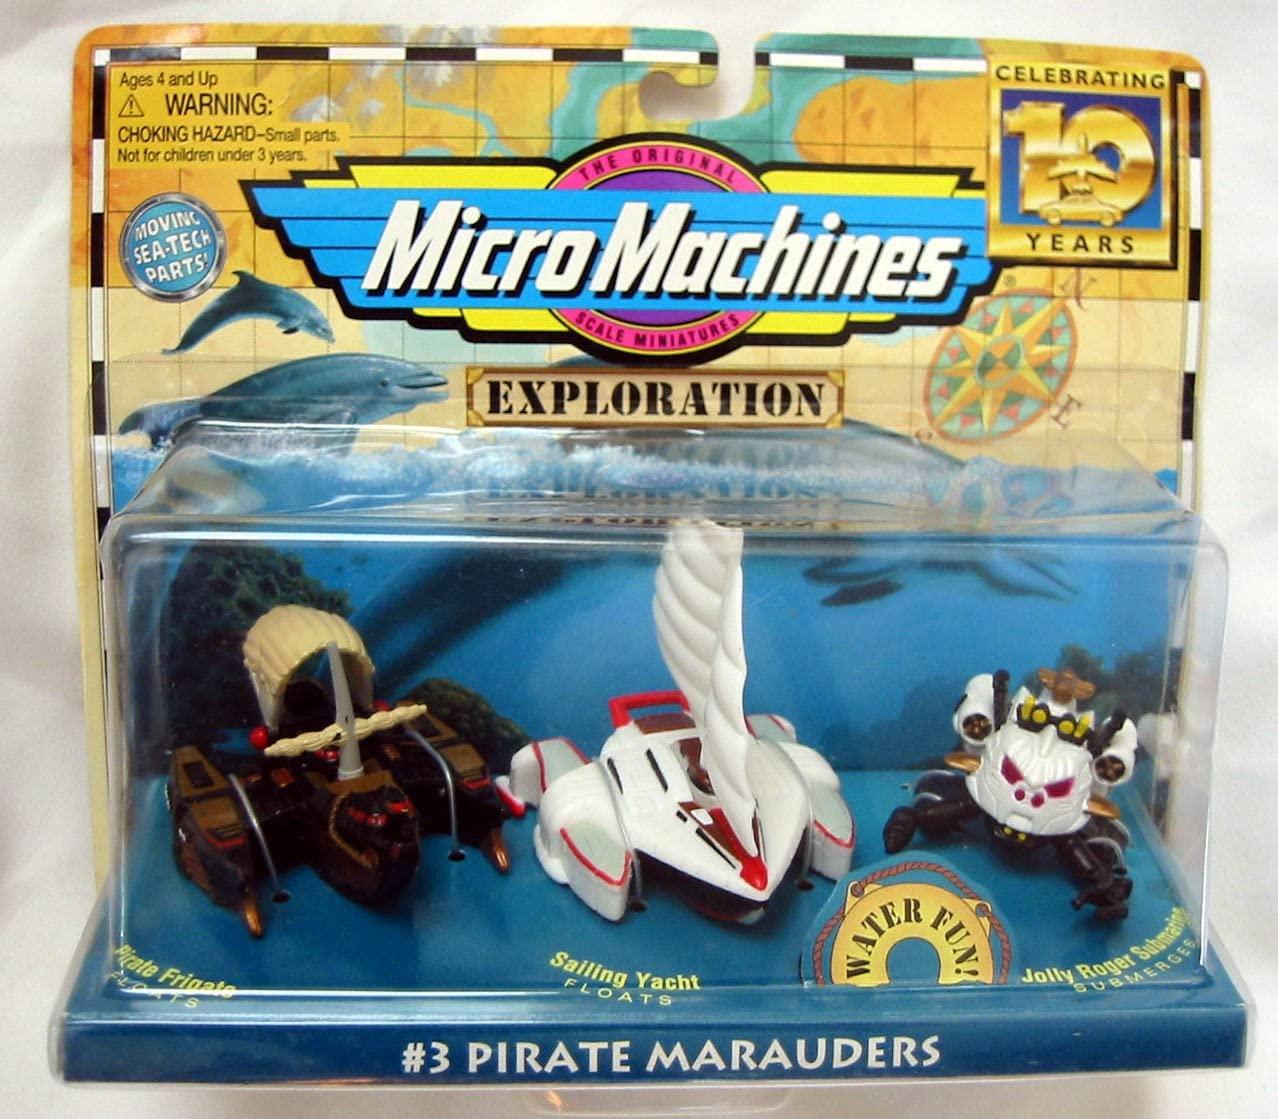 Micro Machines Exploration Pirate Marauders #3